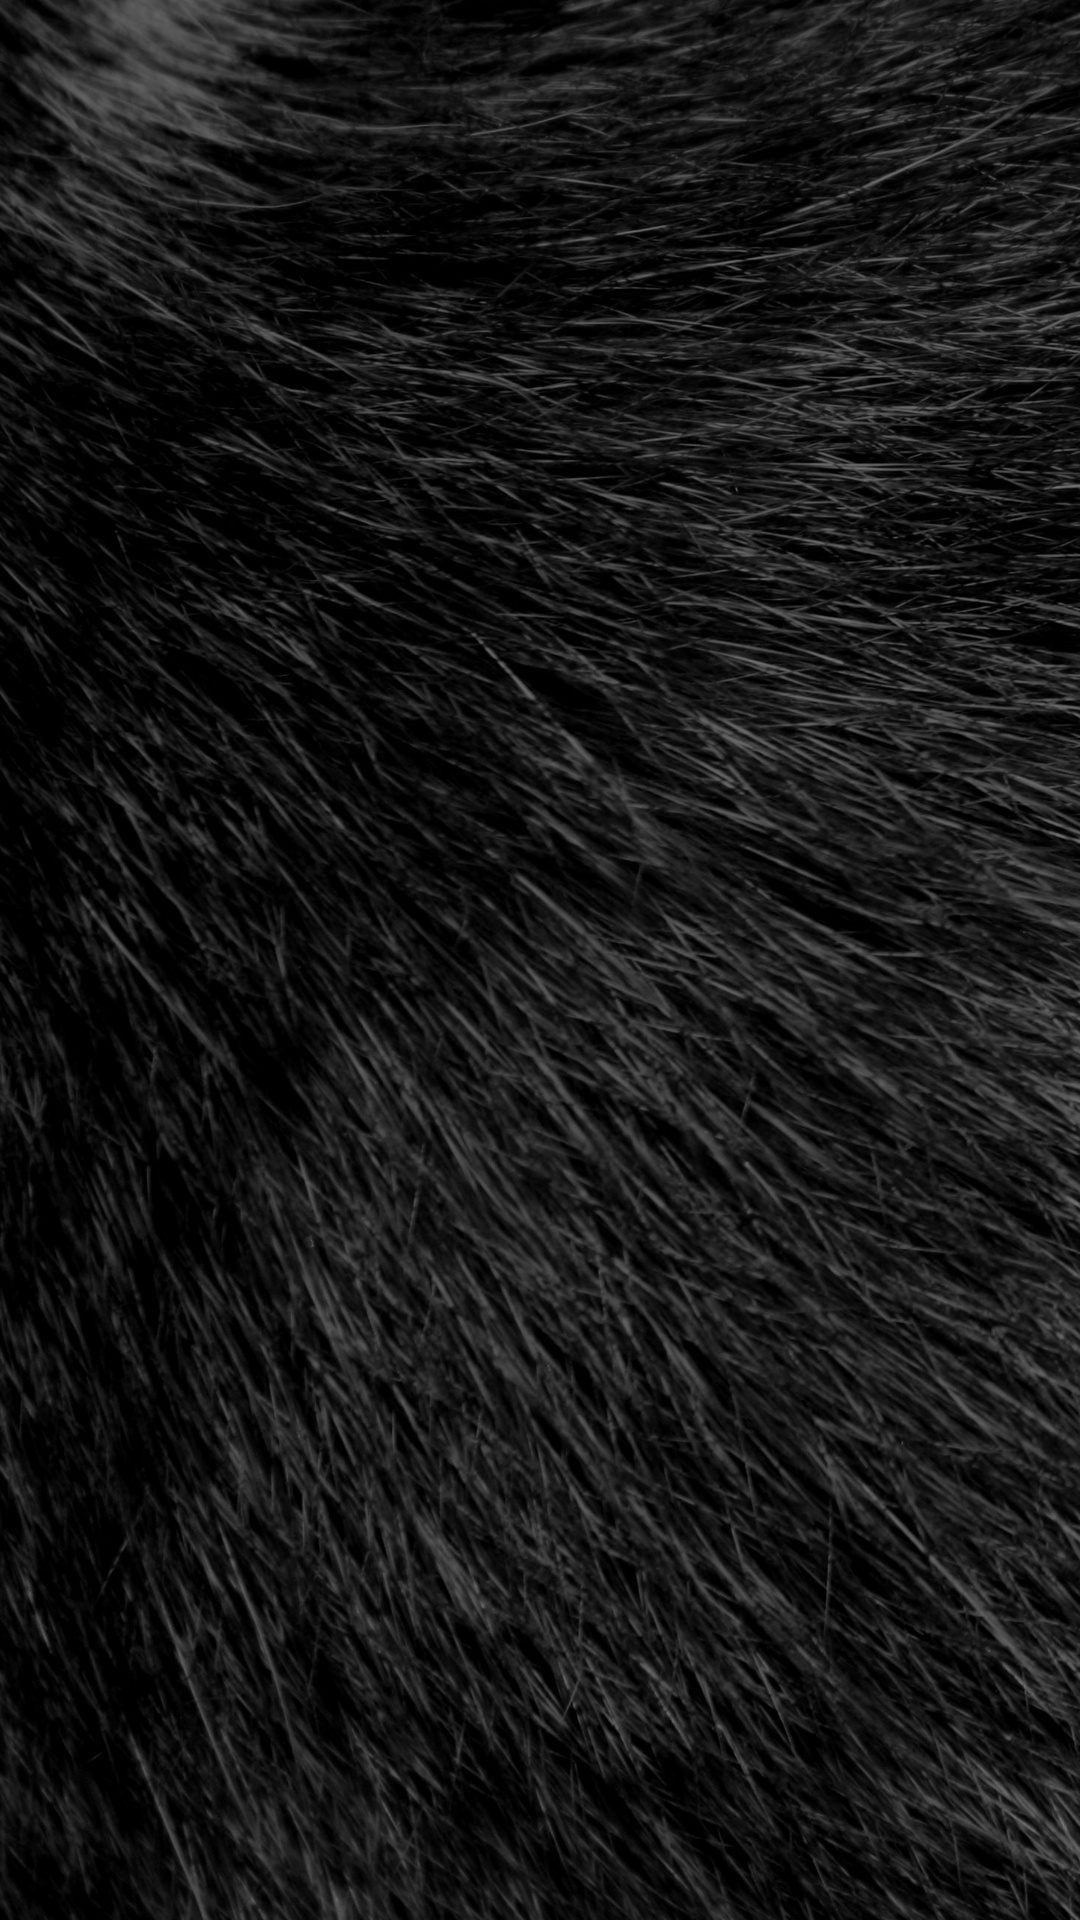 Res: 1080x1920, Download Black Fluffy Fur 1080 x 1920 Wallpapers - 4733560 - fluffy fur  black | mobile9